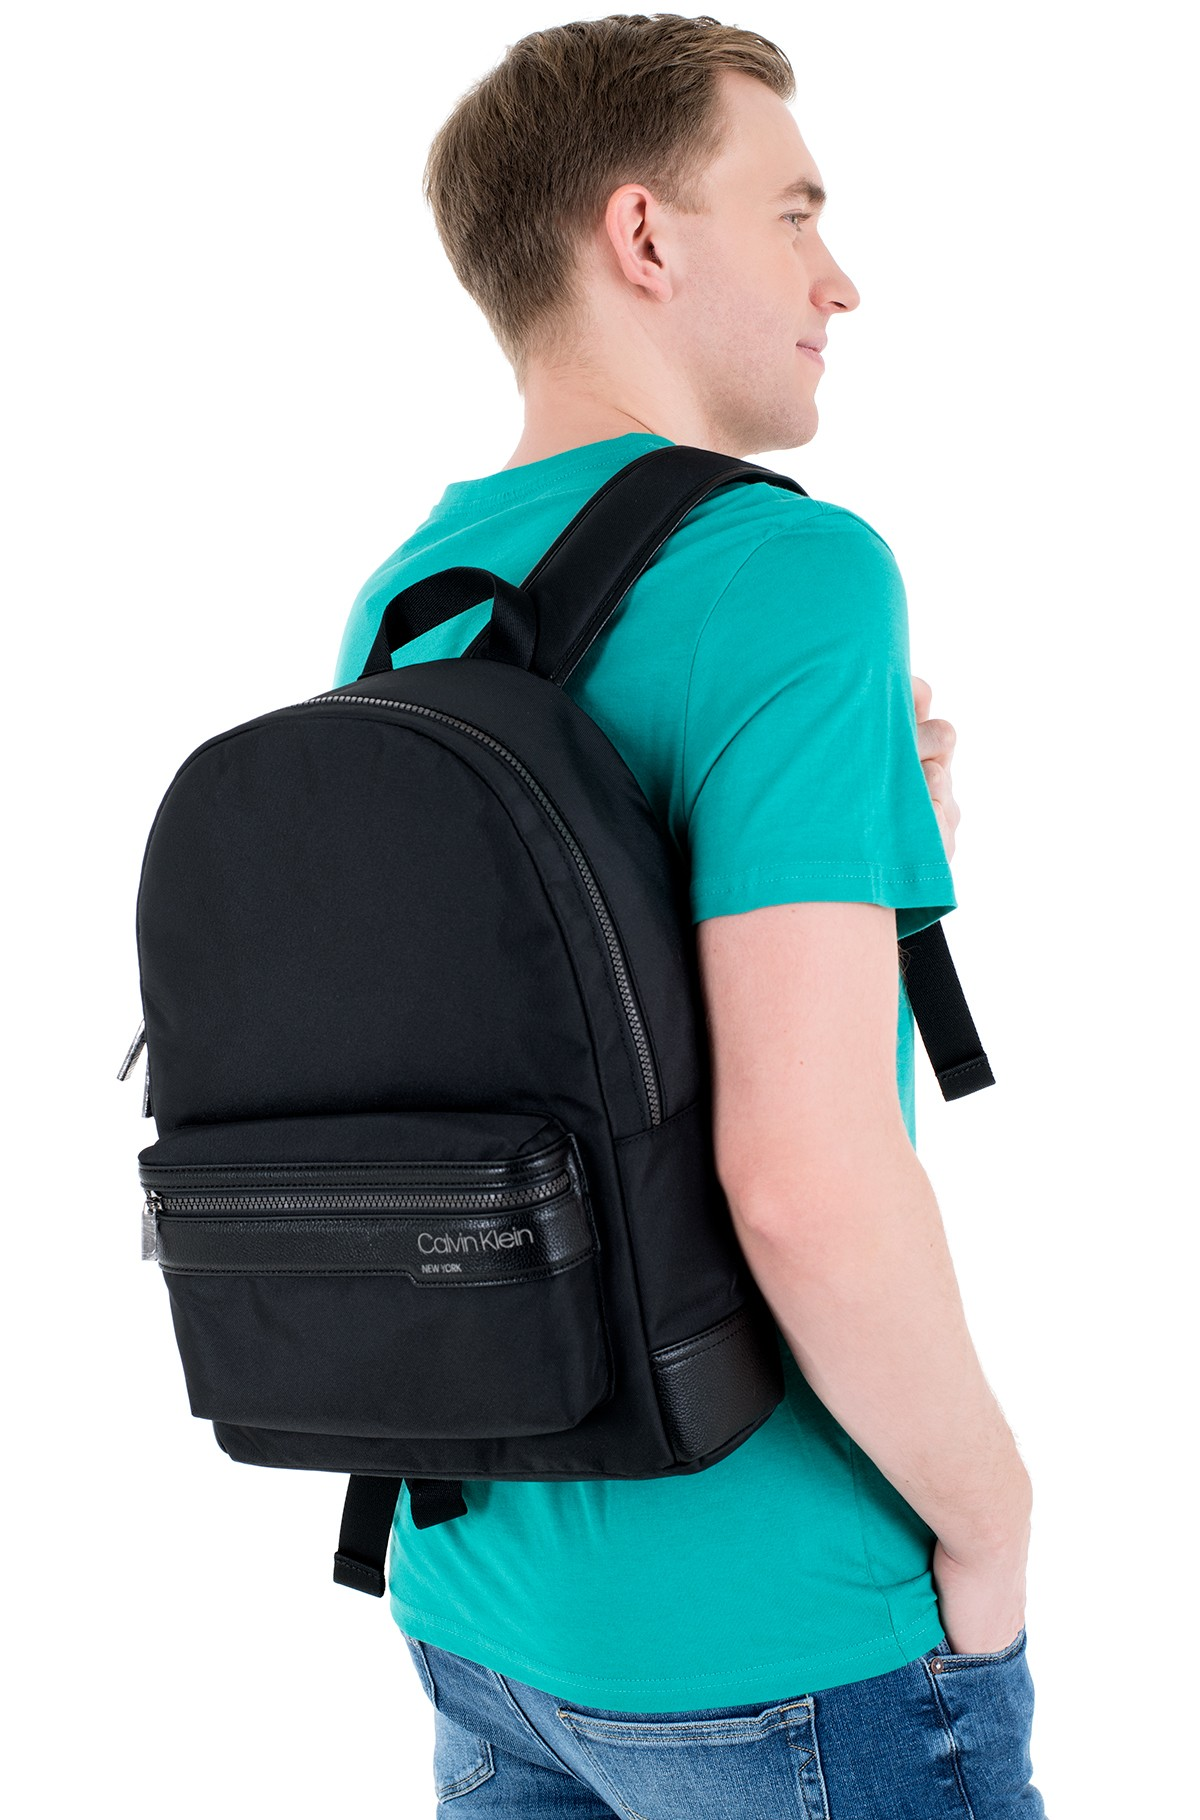 Backbag CAMPUS BP-full-1